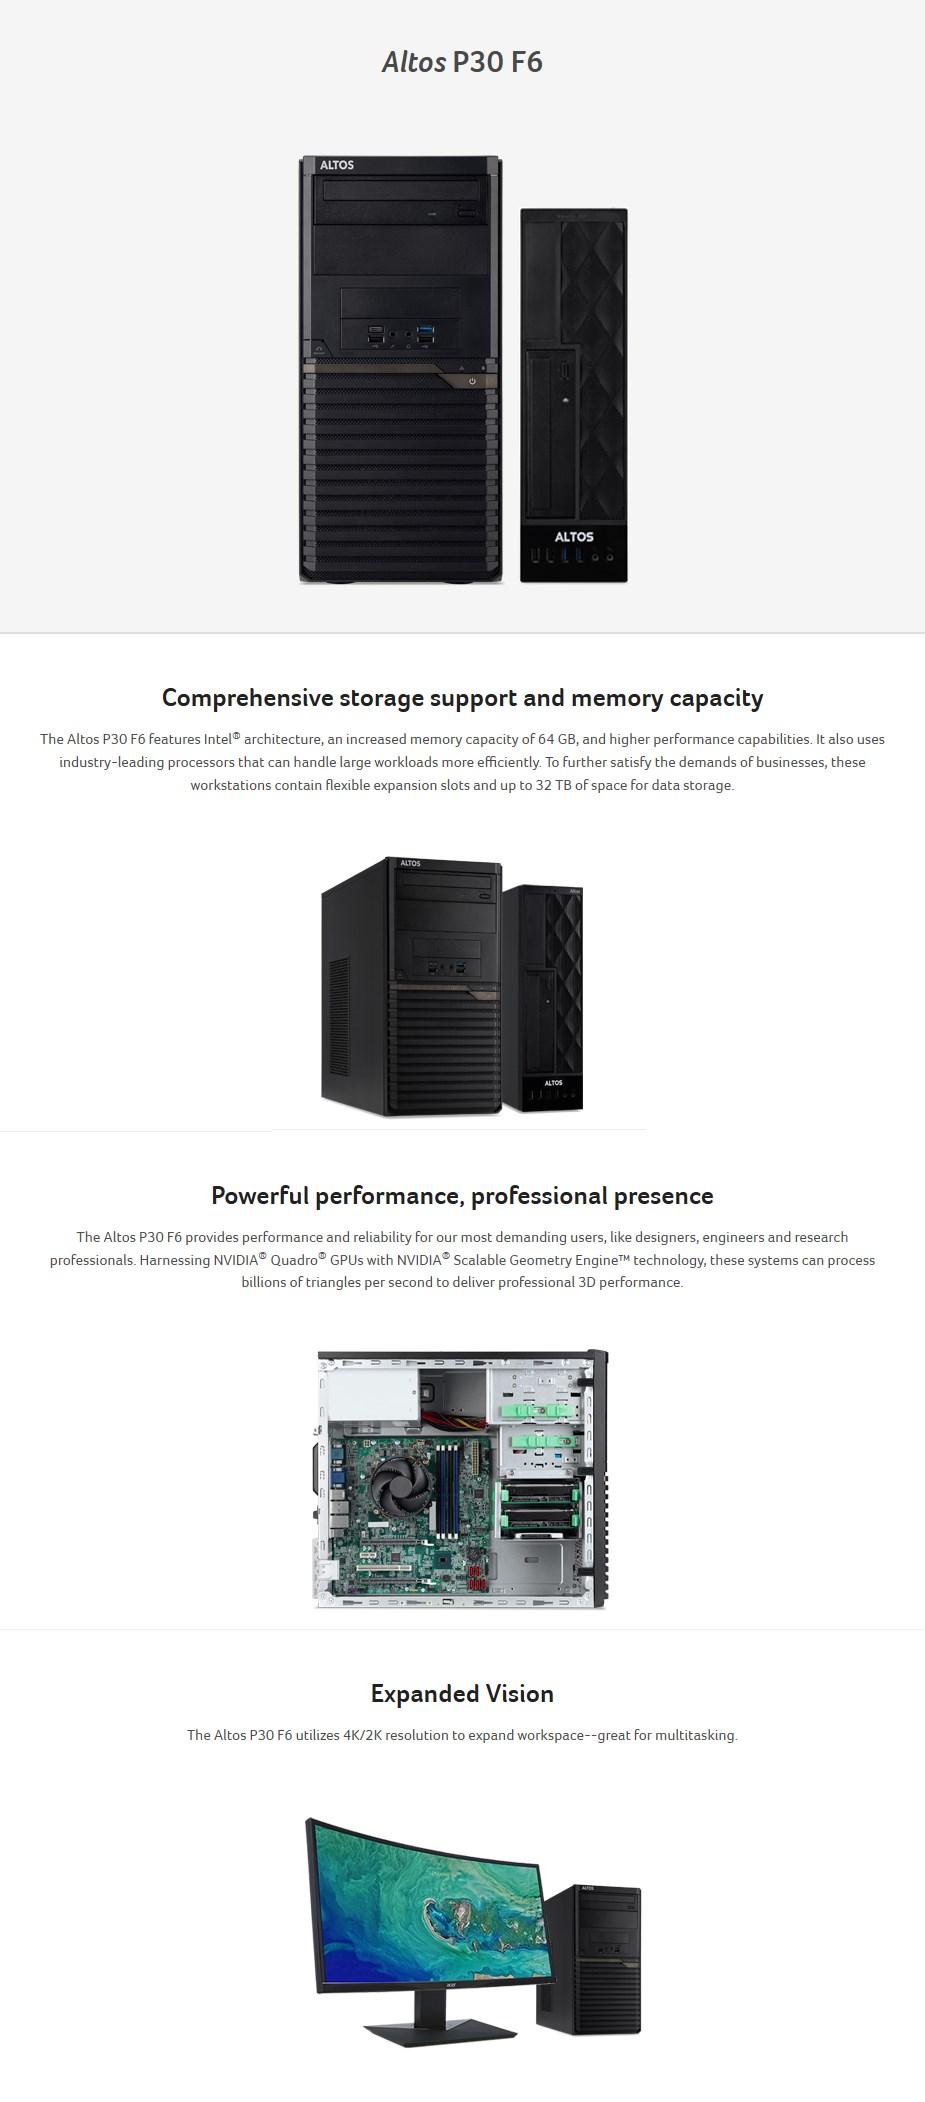 Acer Altos P30 F6 Tower Workstation i9-9900k 32GB 512GB RTX Titan Win10 Pro - Overview 1